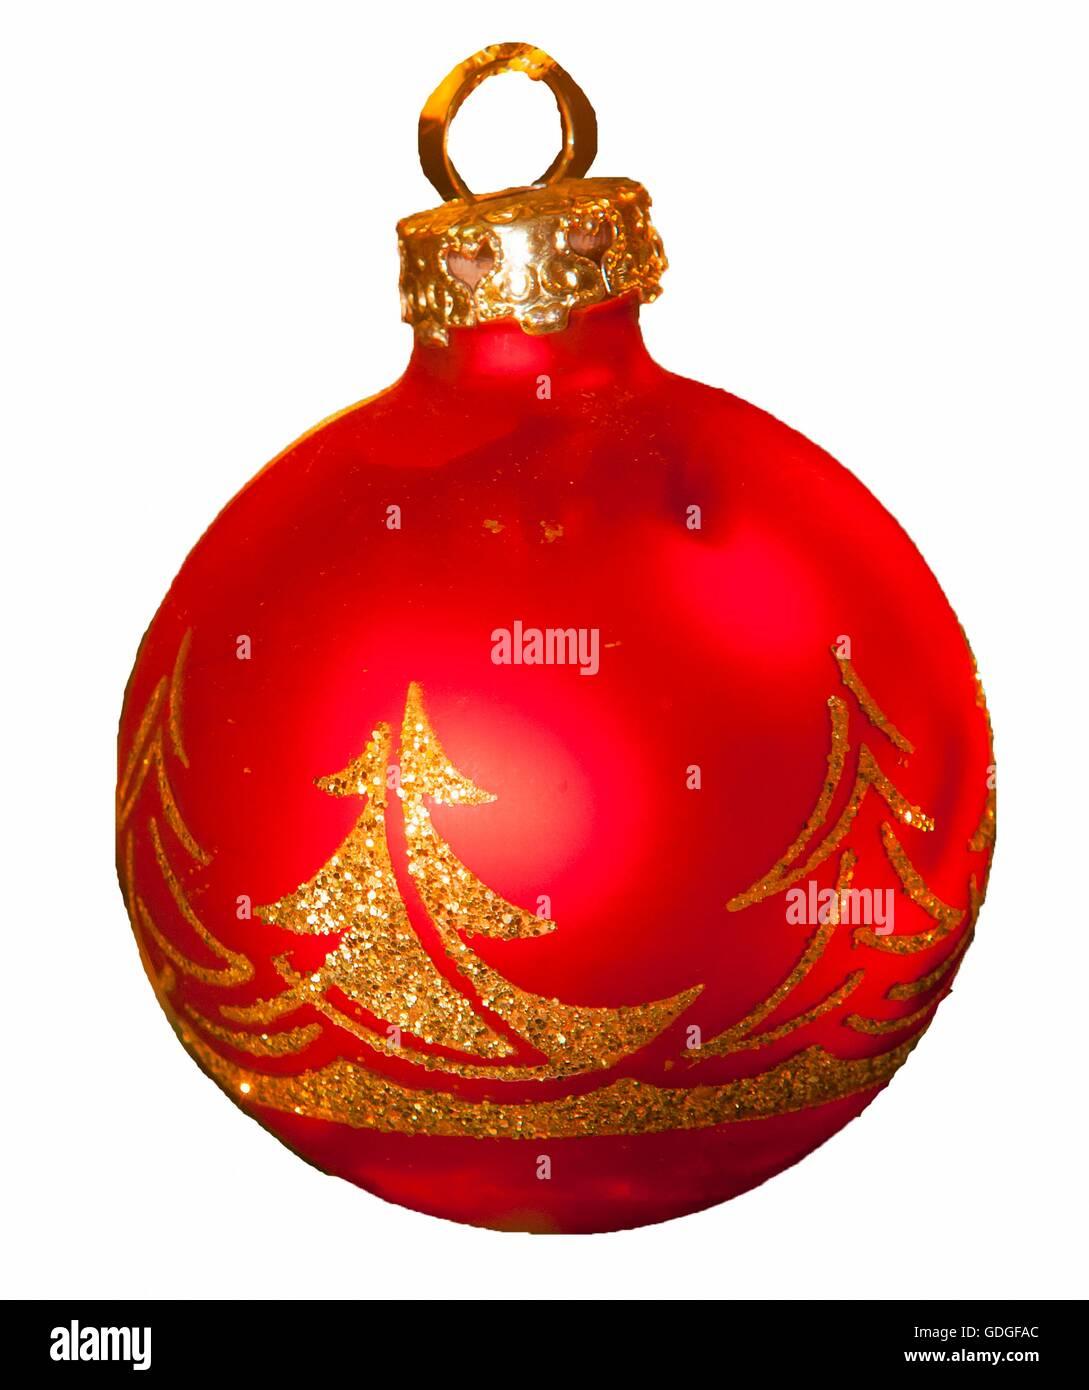 Beeswax candle and Christmas tree ball for Christmas tree decorations - Stock Image